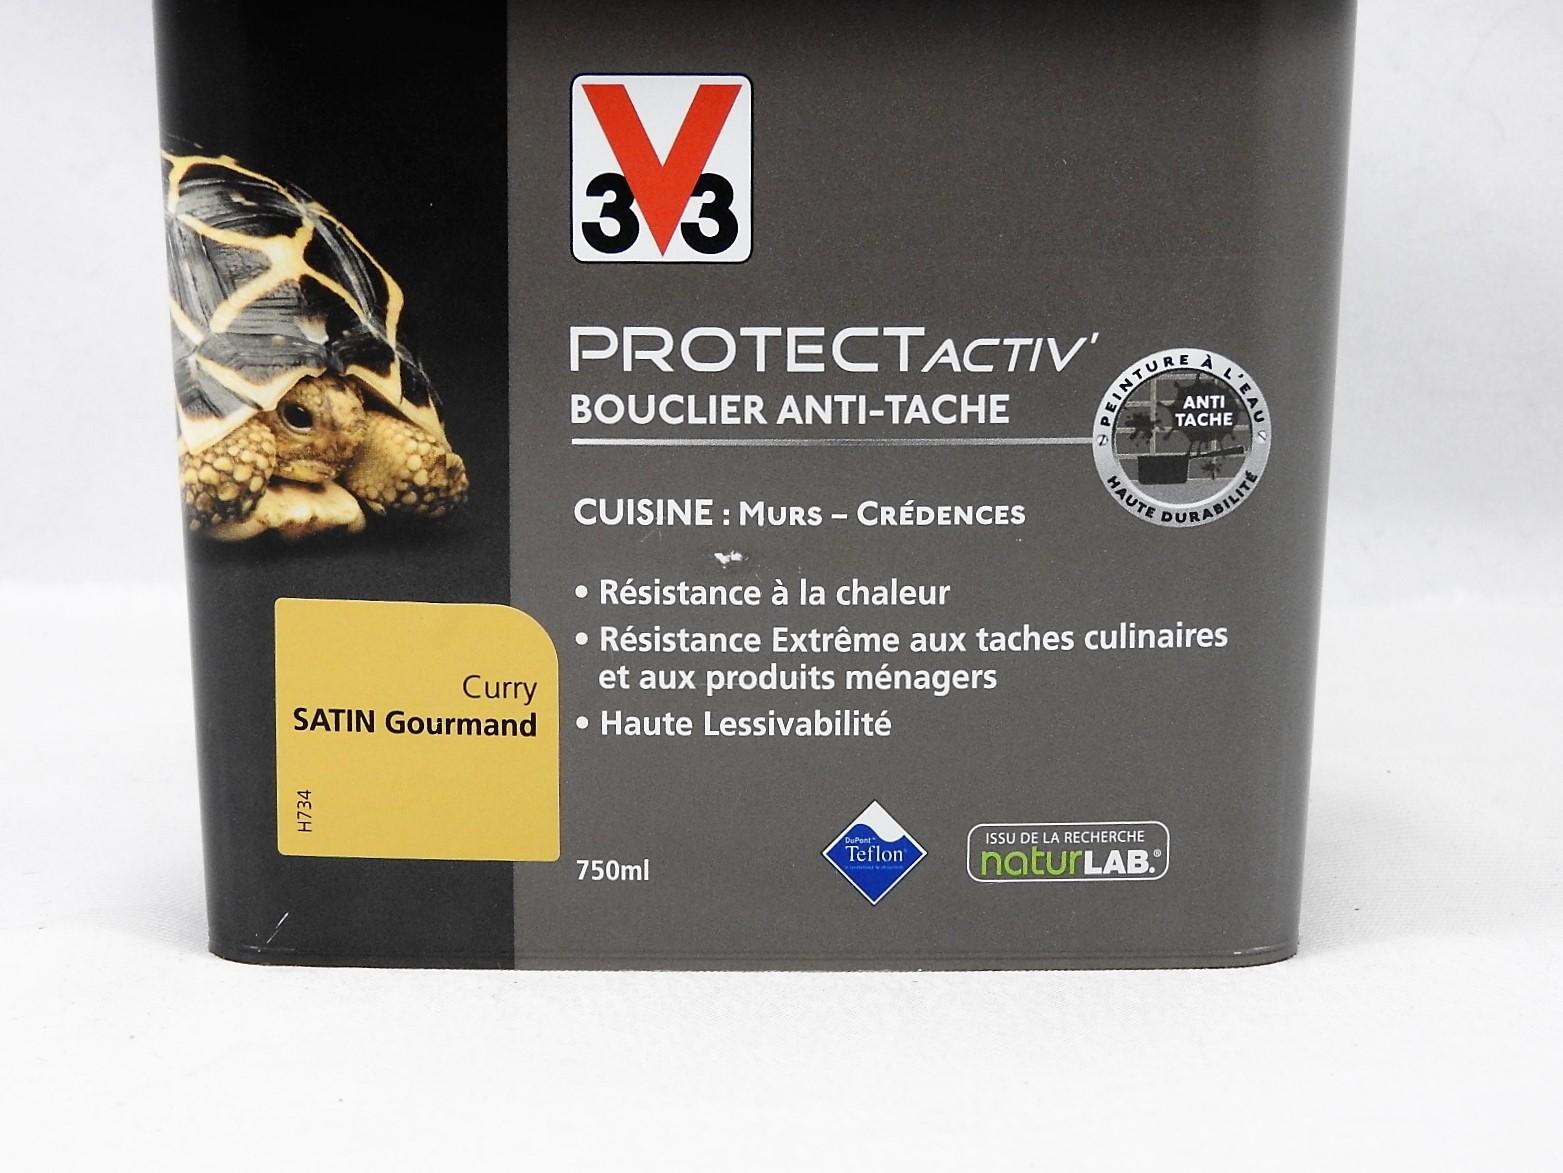 PROTECTactiv V33 Bouclier Anti Tache 750ml 18.JPG